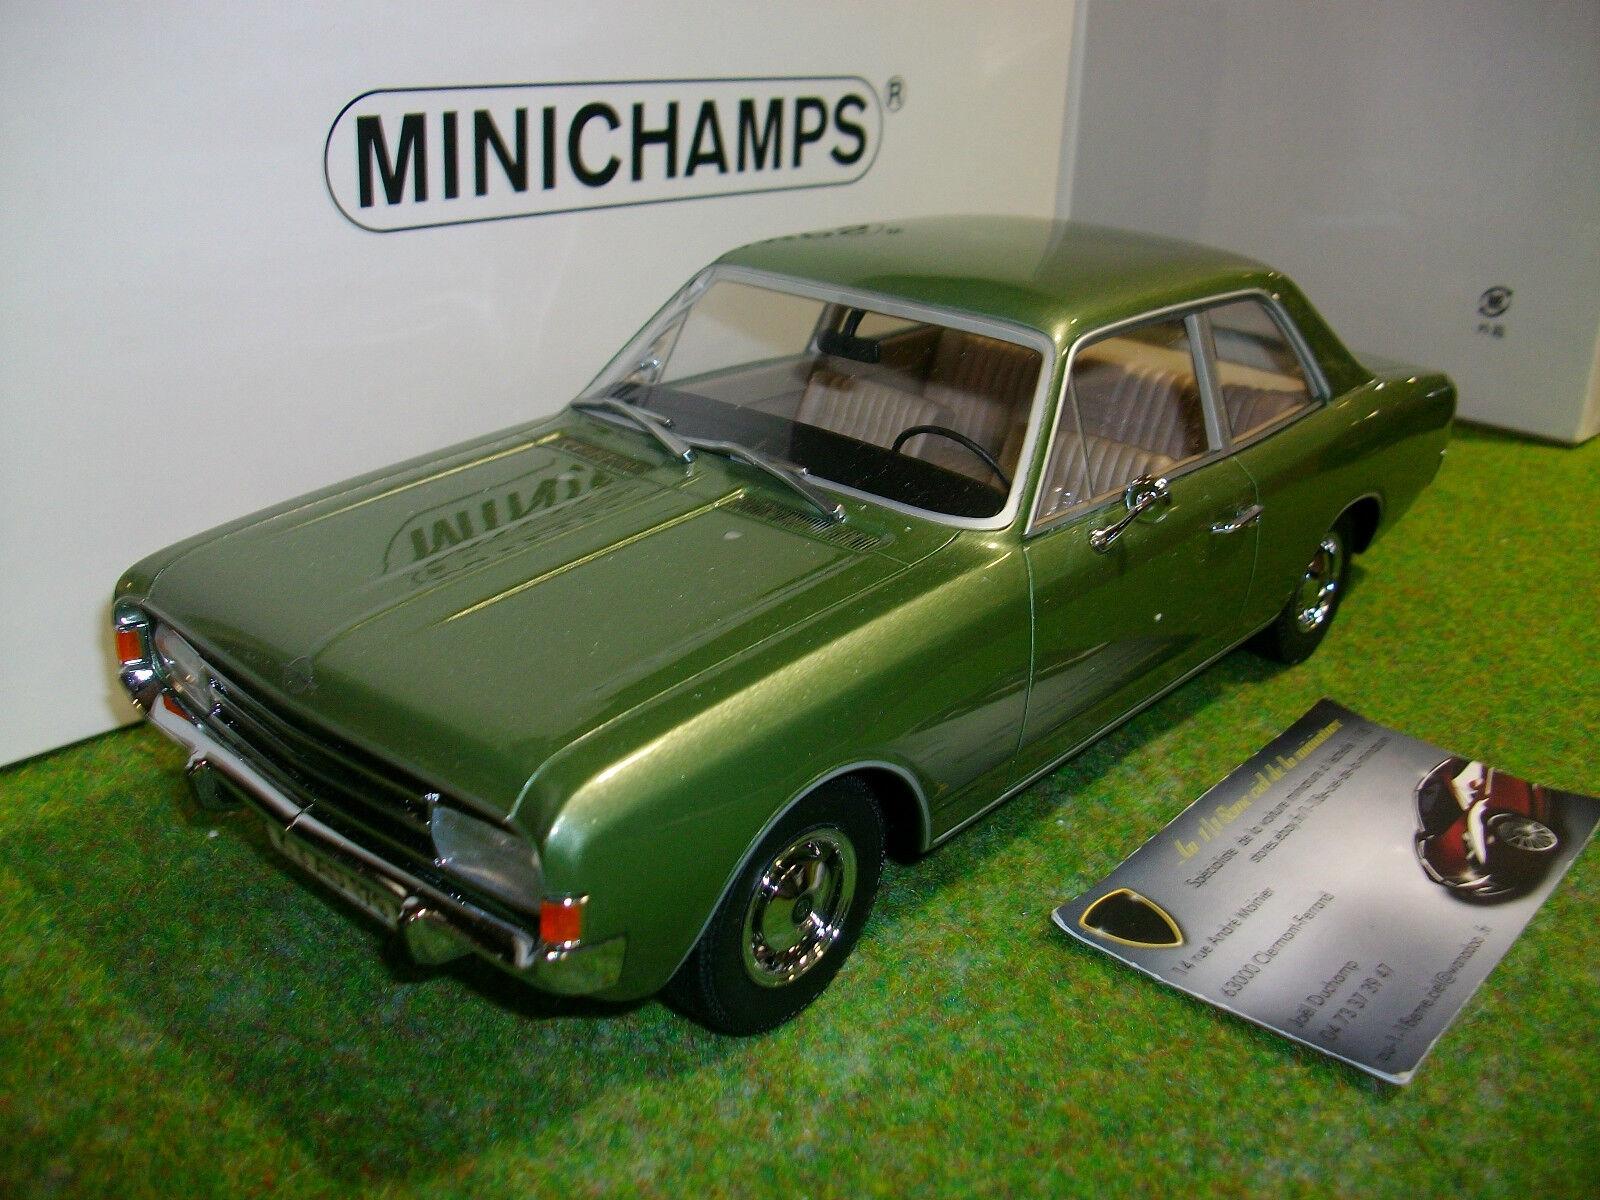 OPEL REKORD C SALOON SALOON SALOON verdee 1966 au 1 18 MINICHAMPS 107047000 voiture miniature b92103